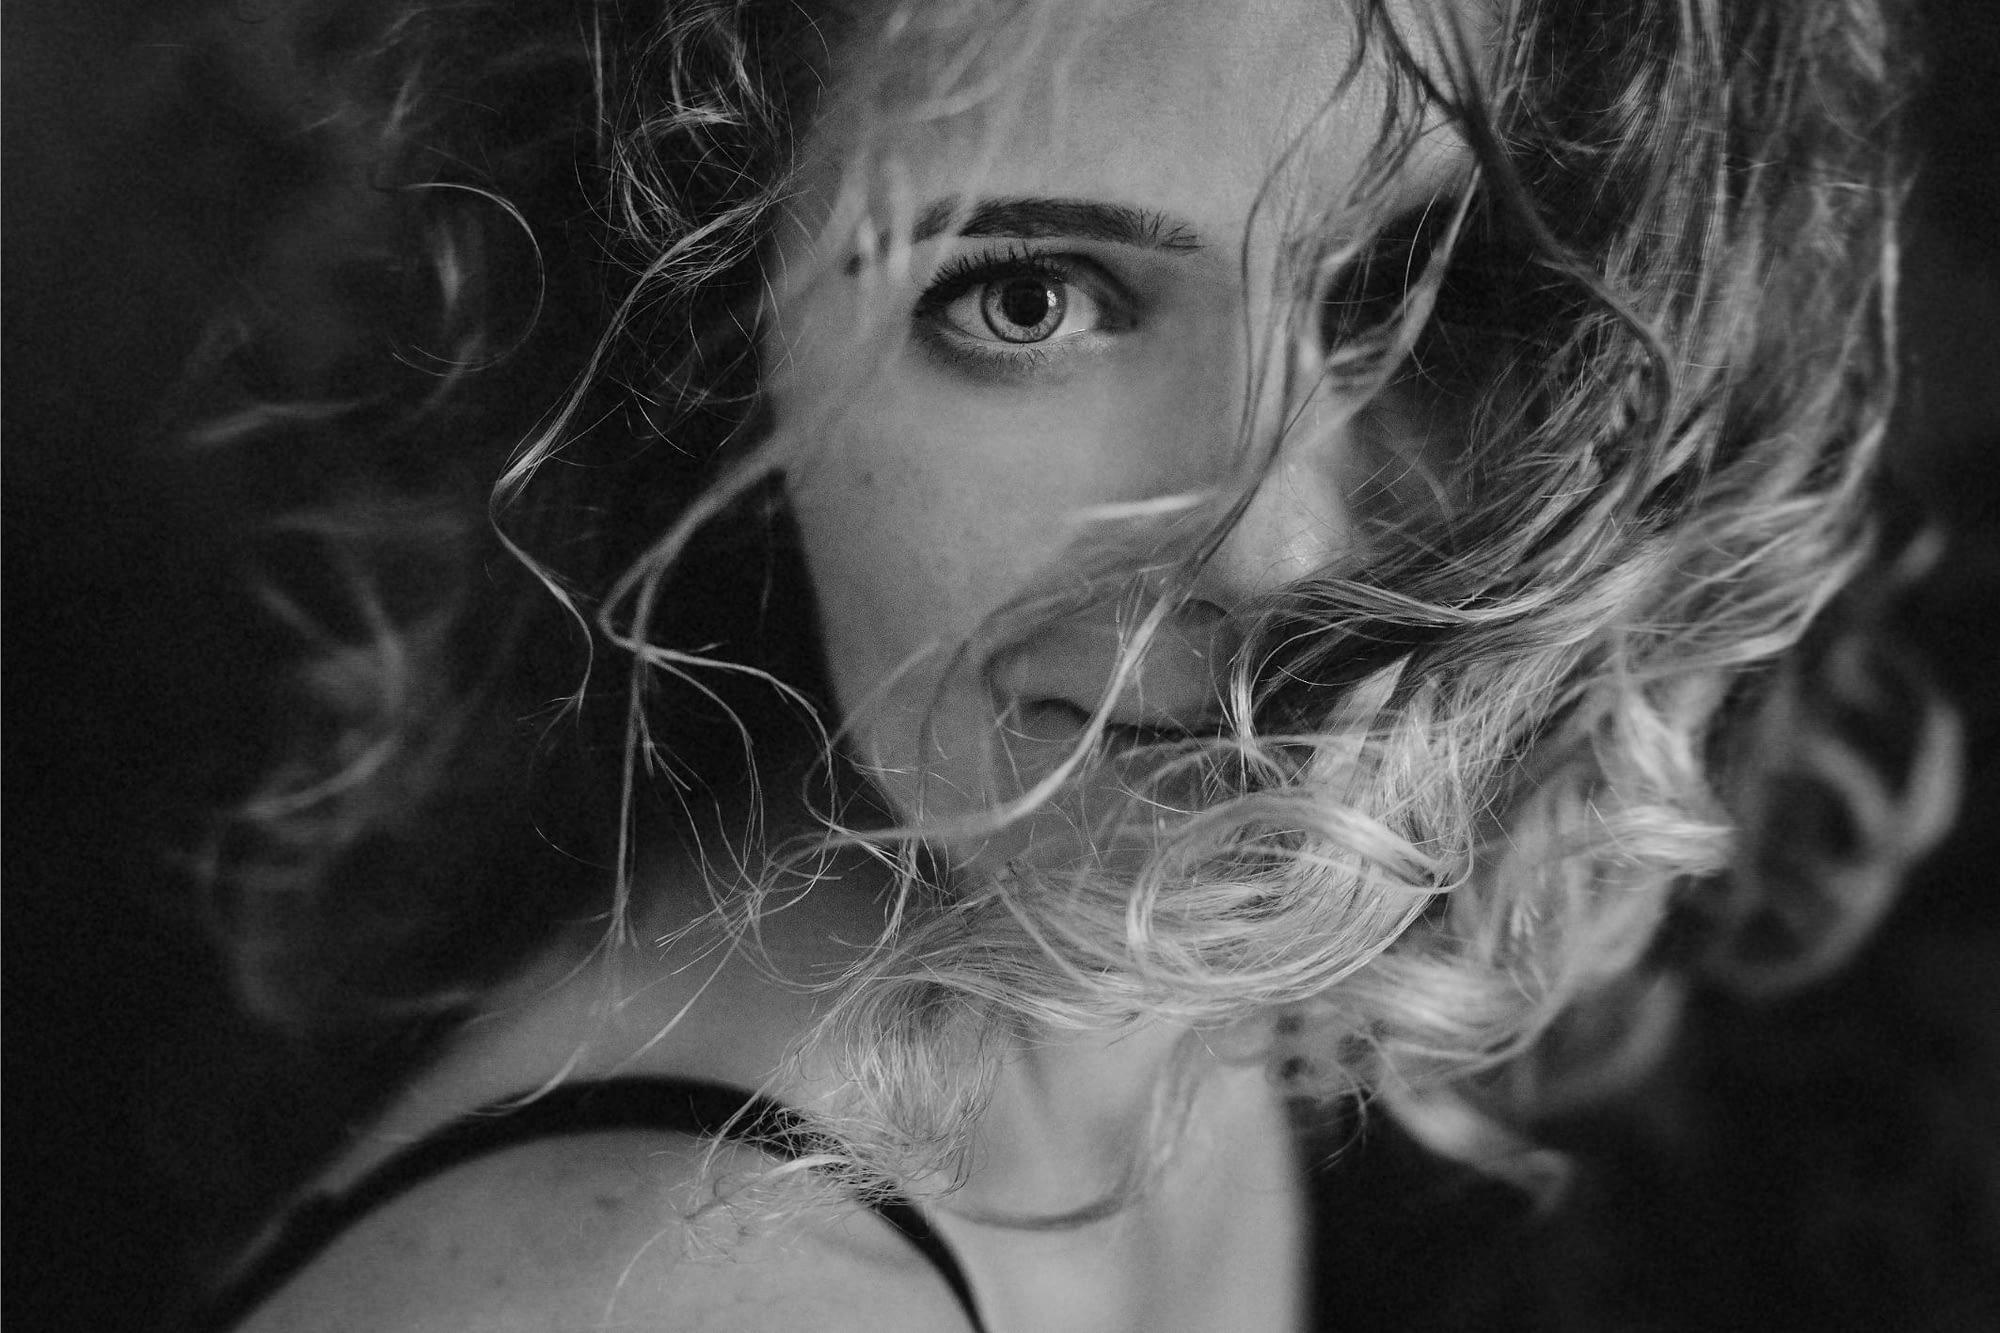 alina-botica-fotograf-portret-irina-bescuca-rawyou (17)